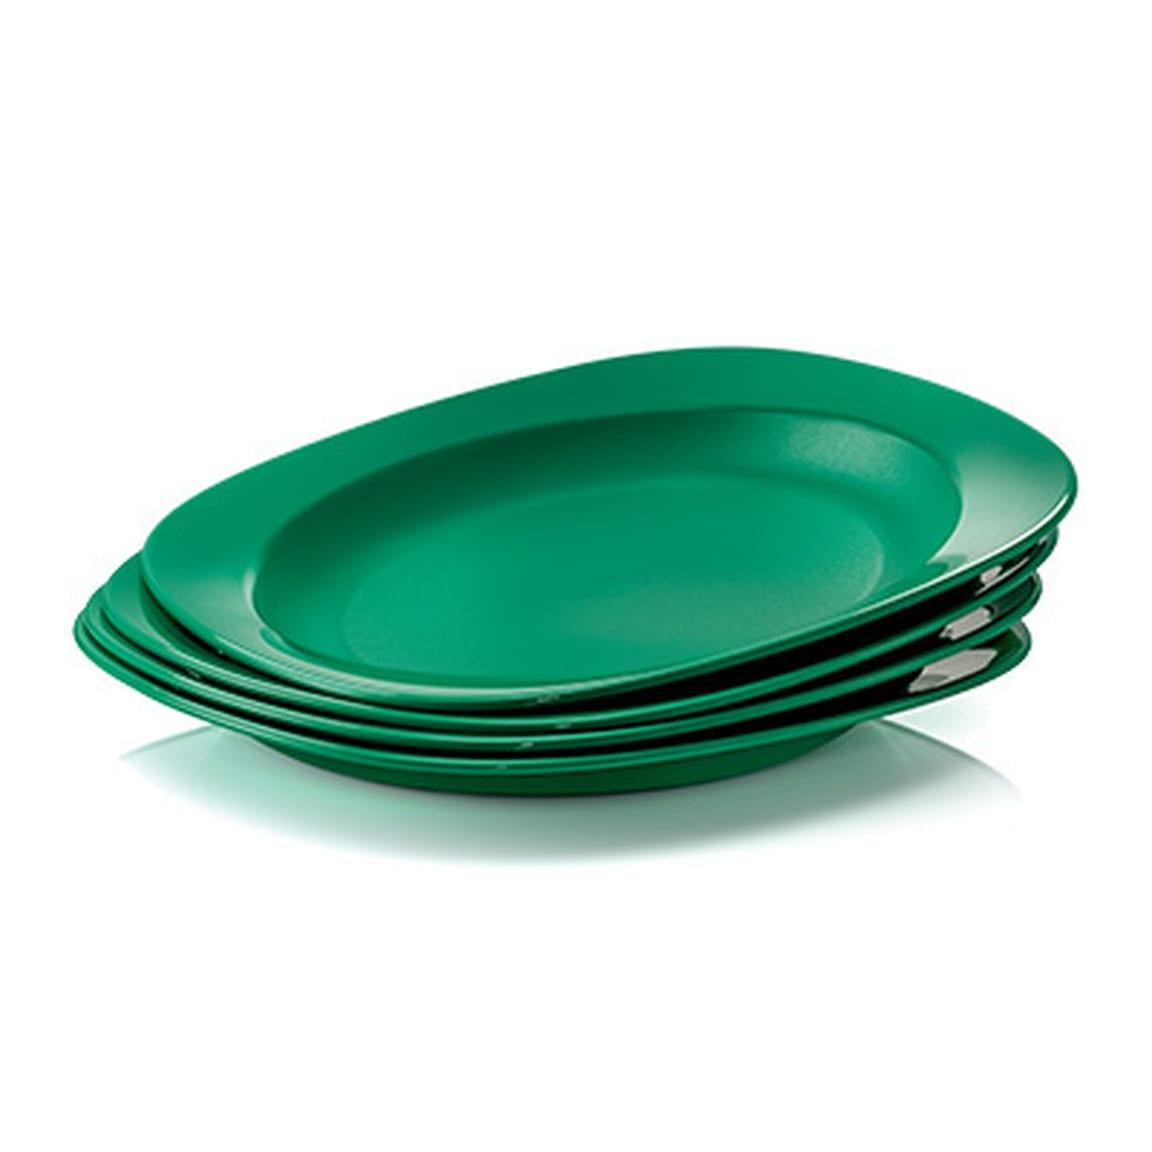 Emerald Plates (4)